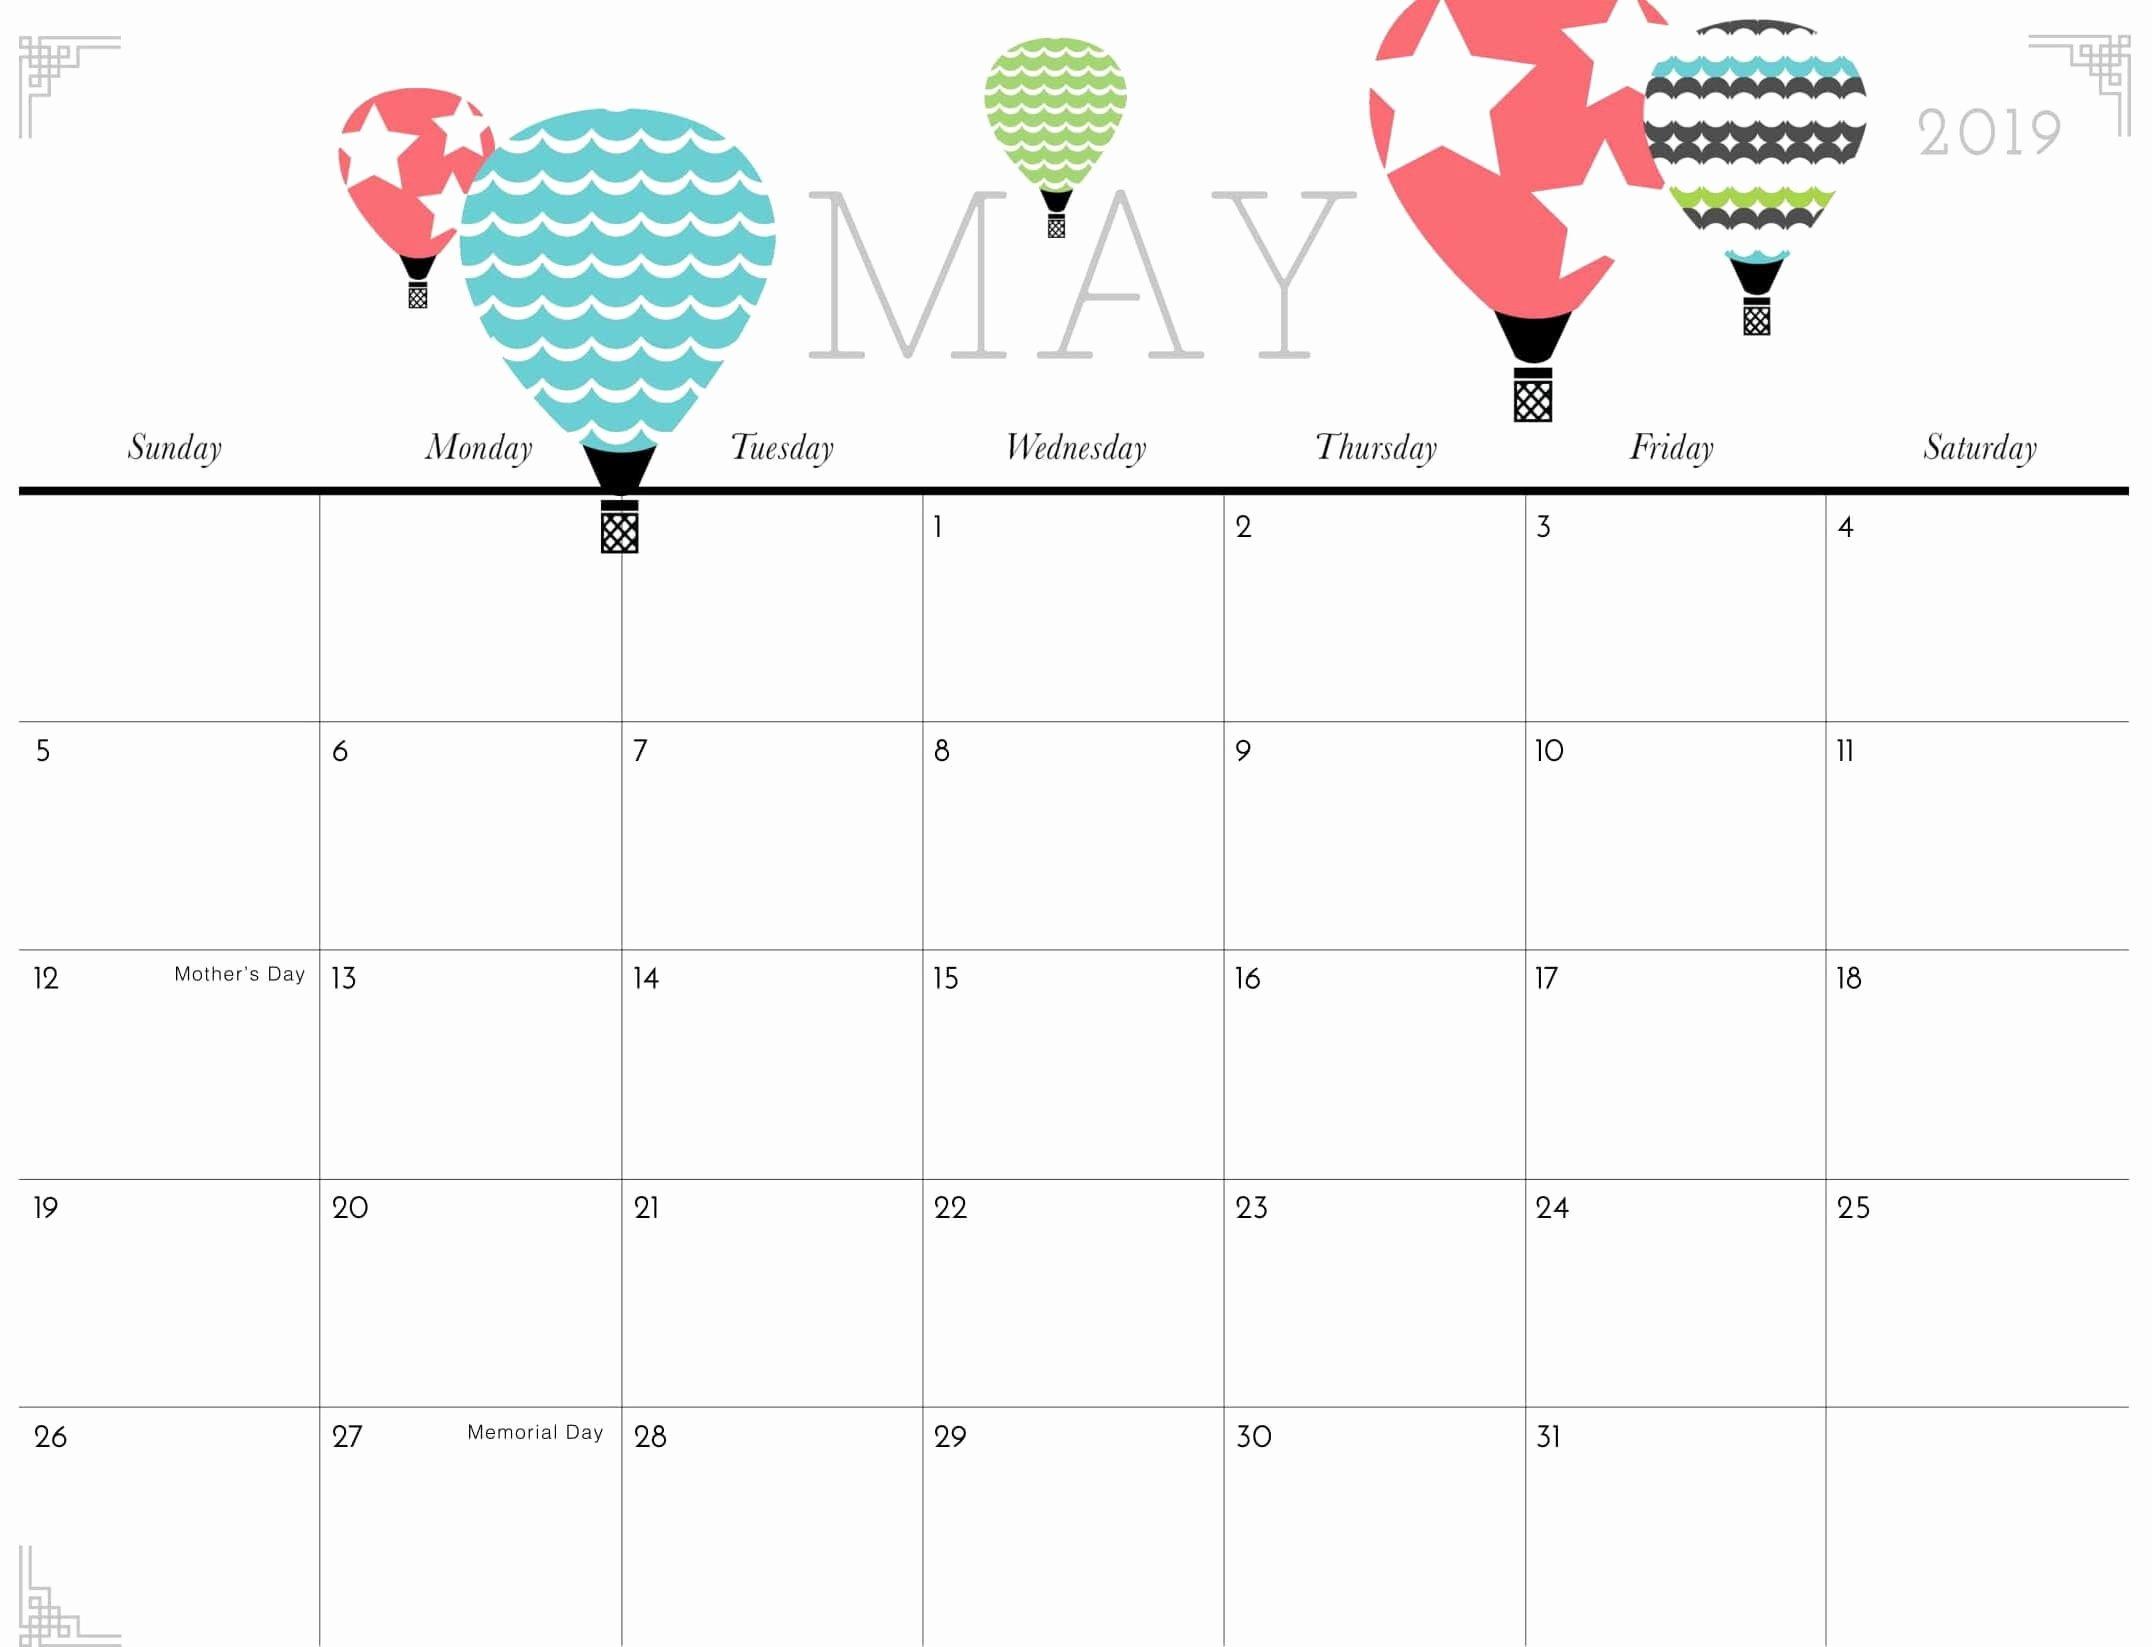 2019 Cute Calendar Printable New Cute May 2019 Calendar Printable for Kids